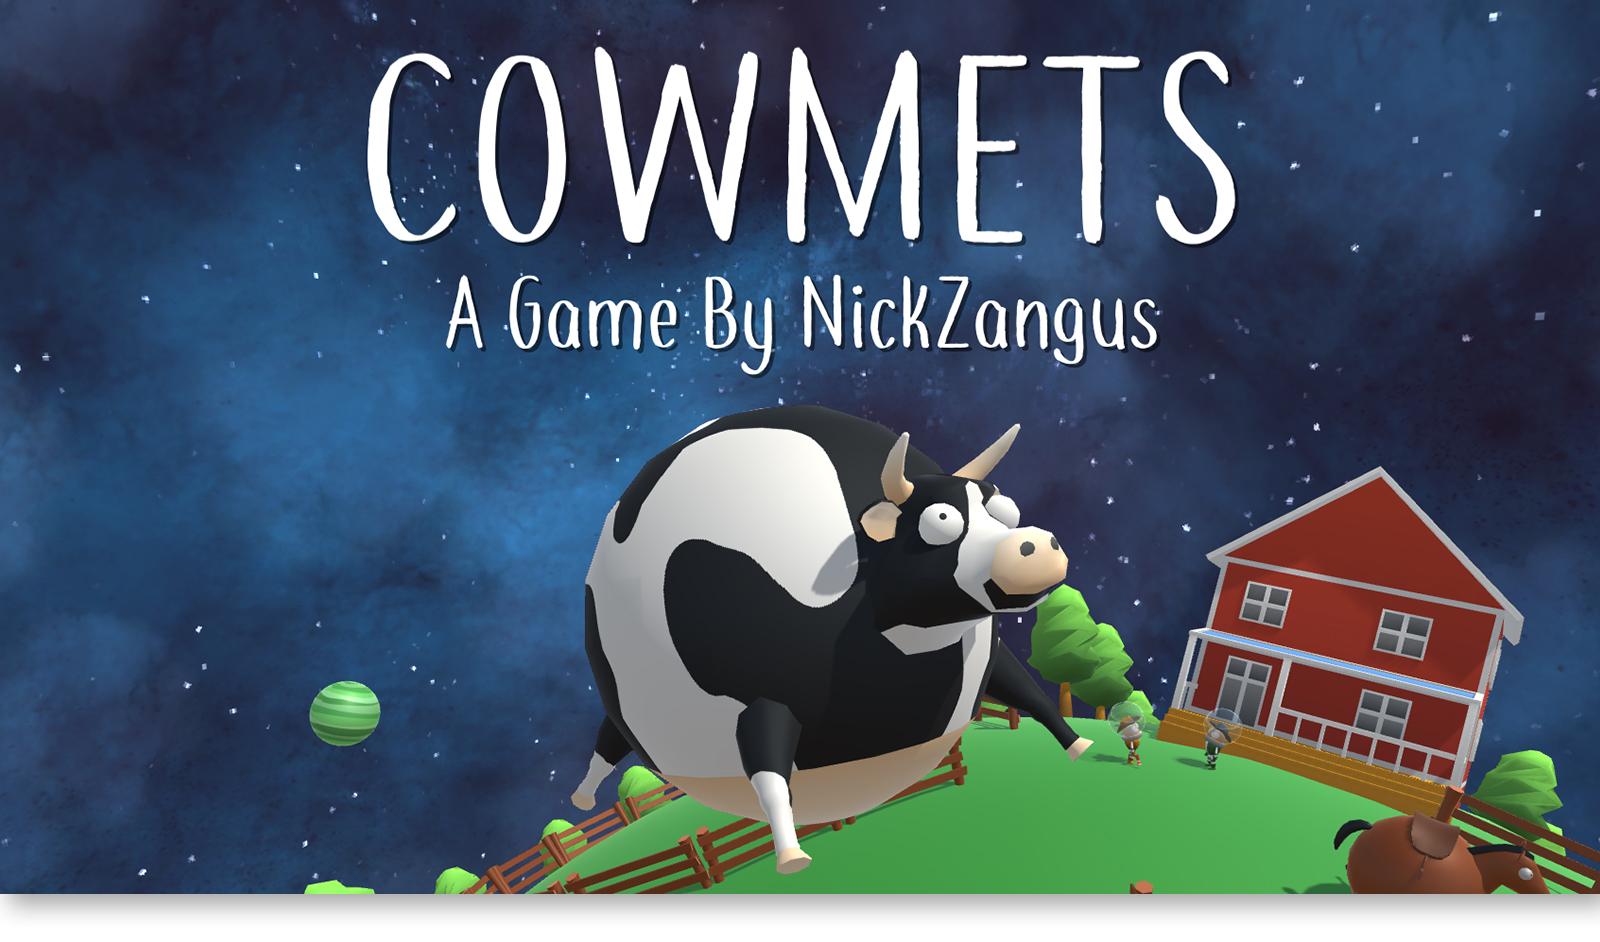 Cowmets